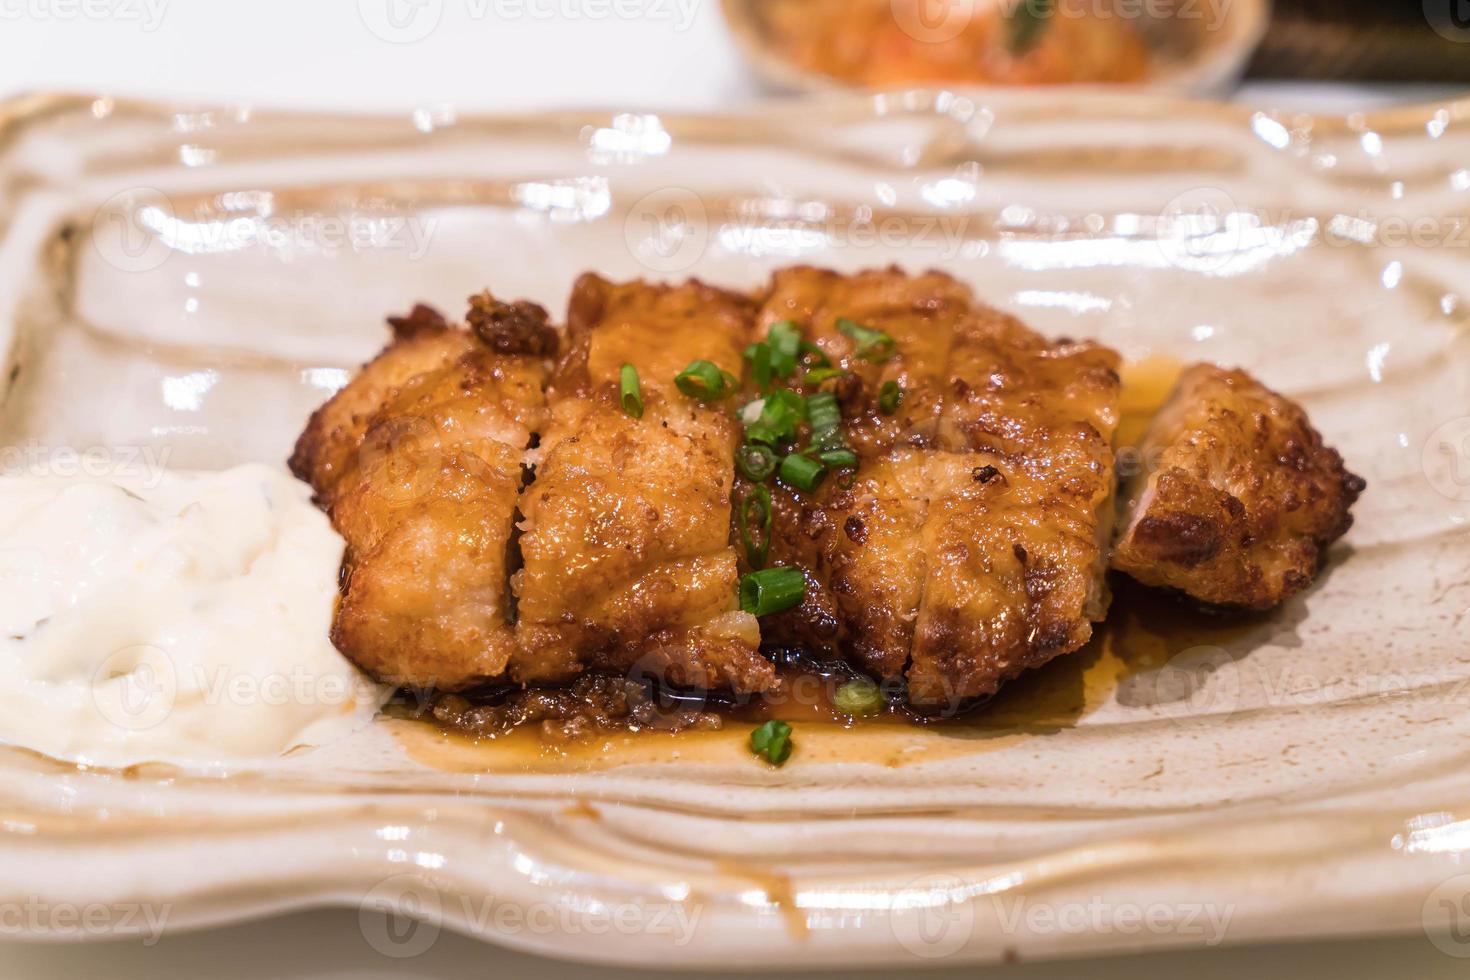 frango frito com molho teriyaki - comida japonesa foto